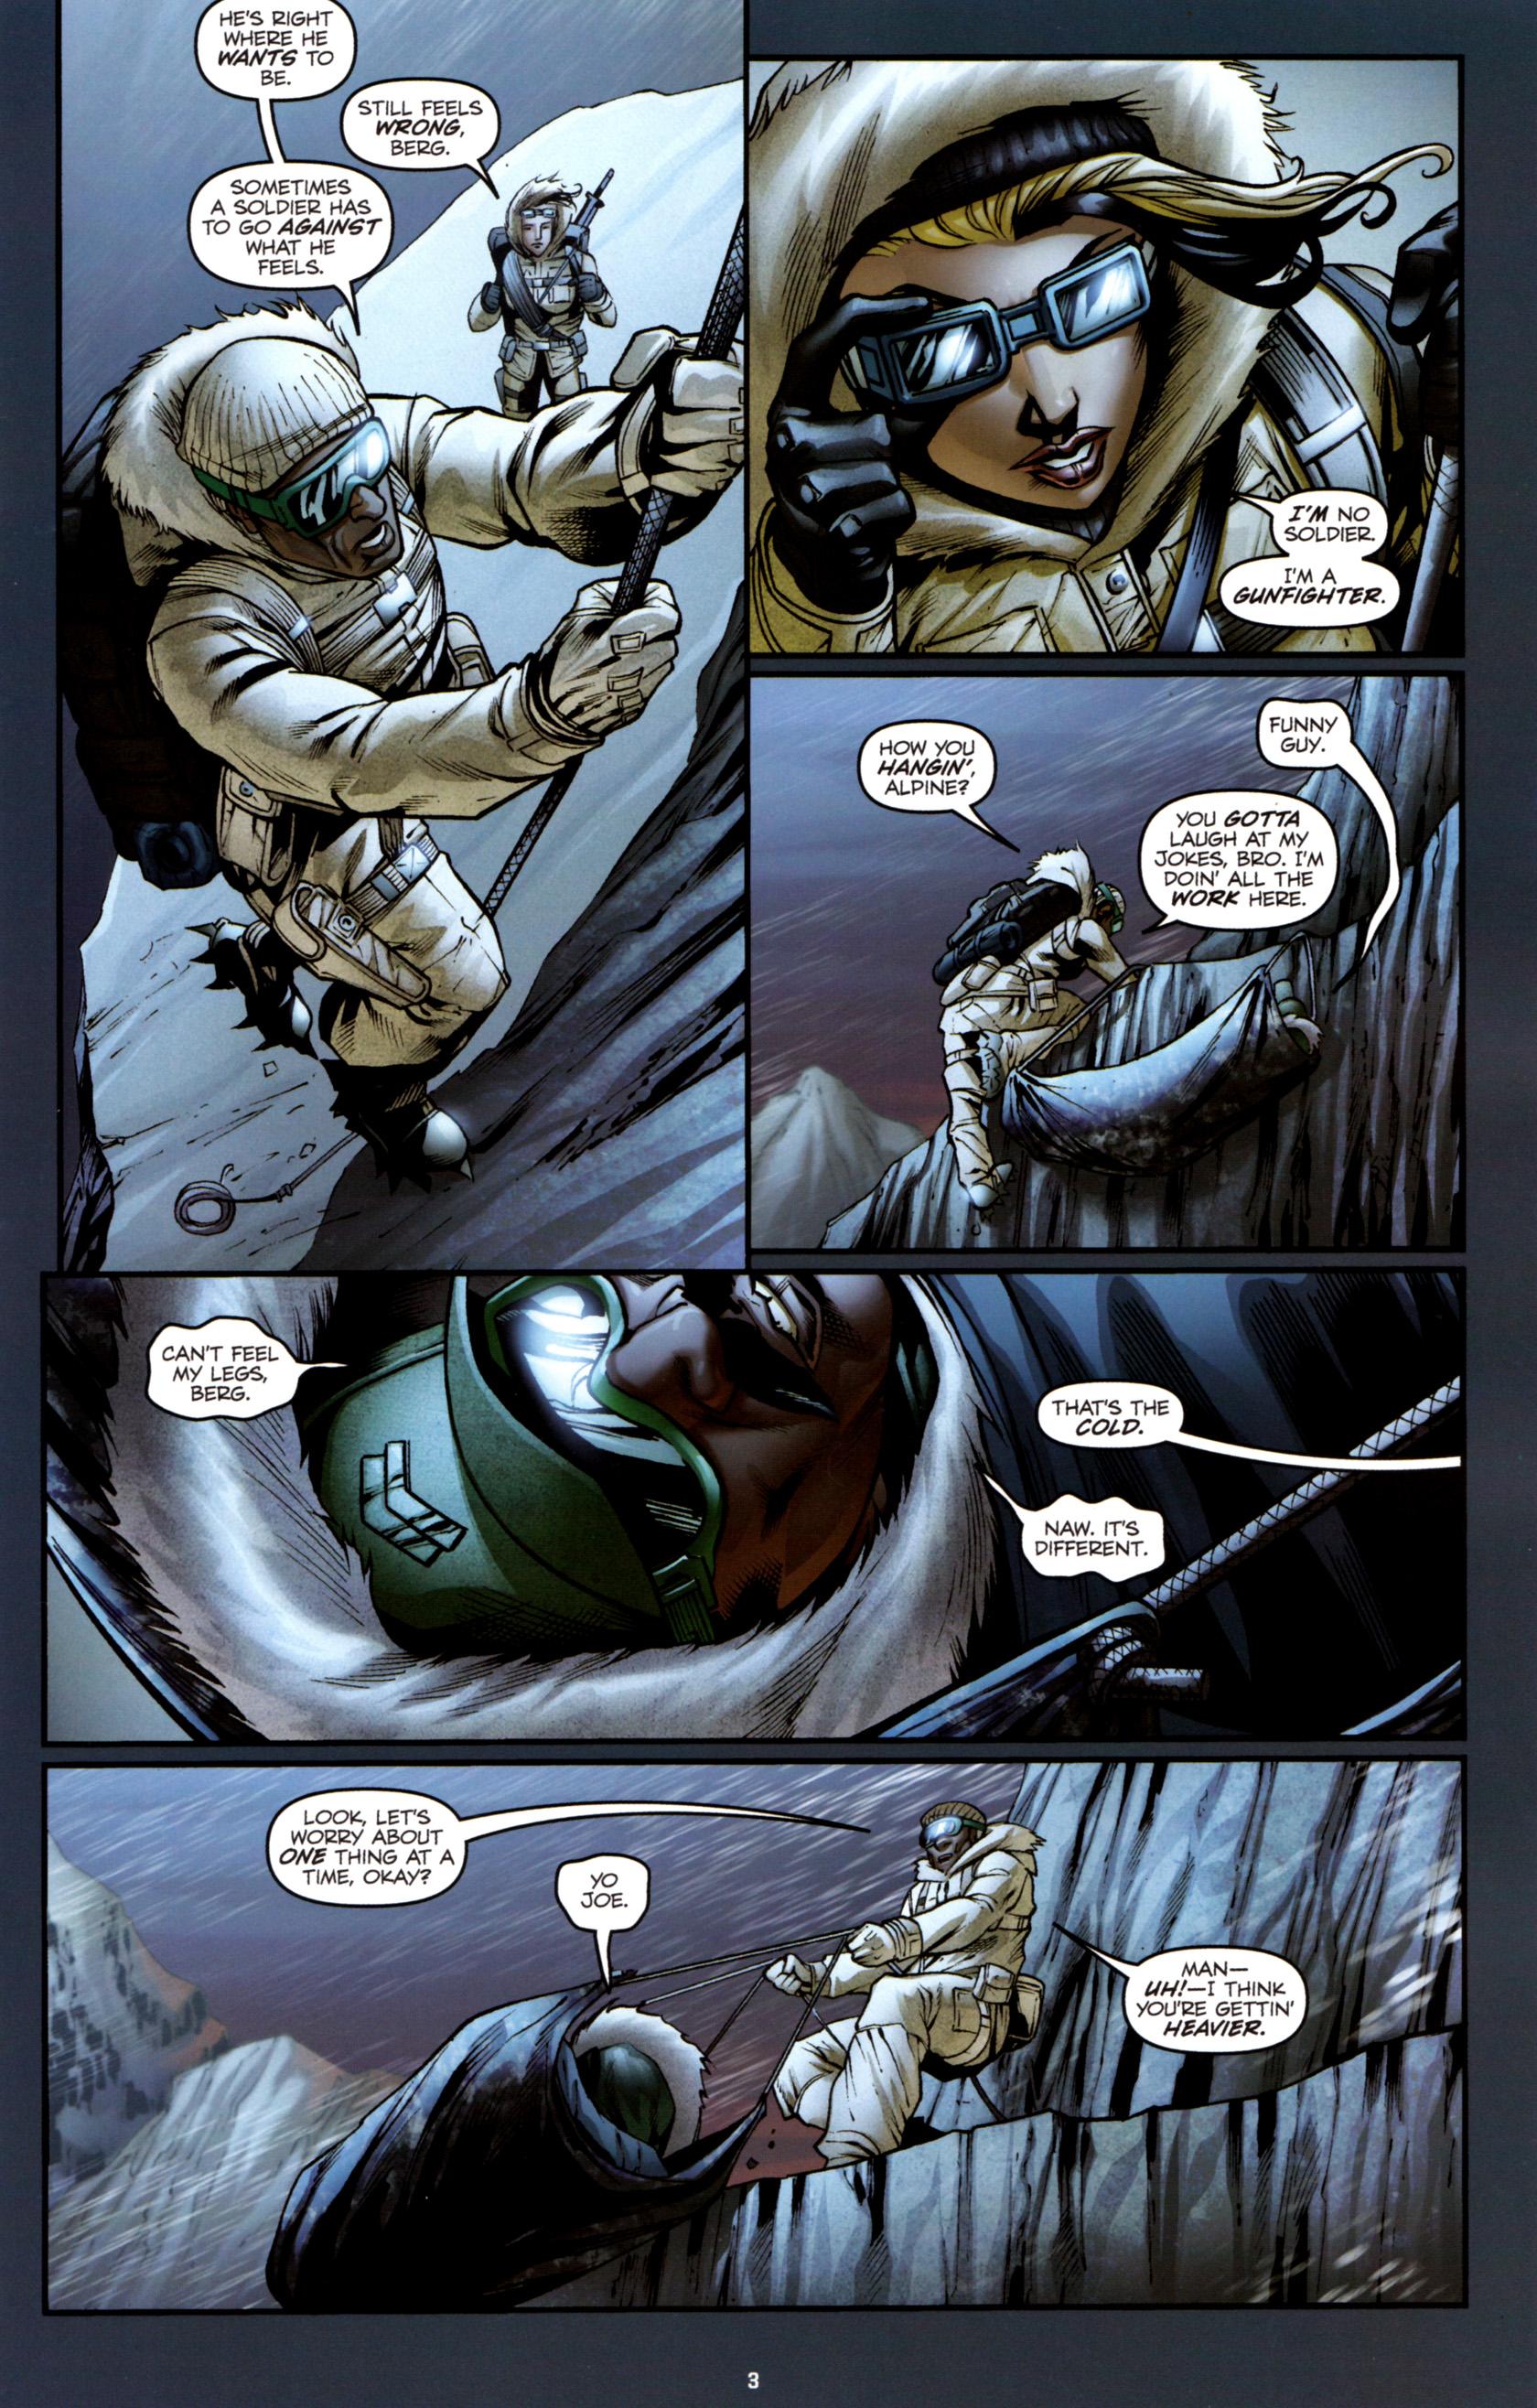 Read online G.I. Joe: Snake Eyes comic -  Issue #3 - 6